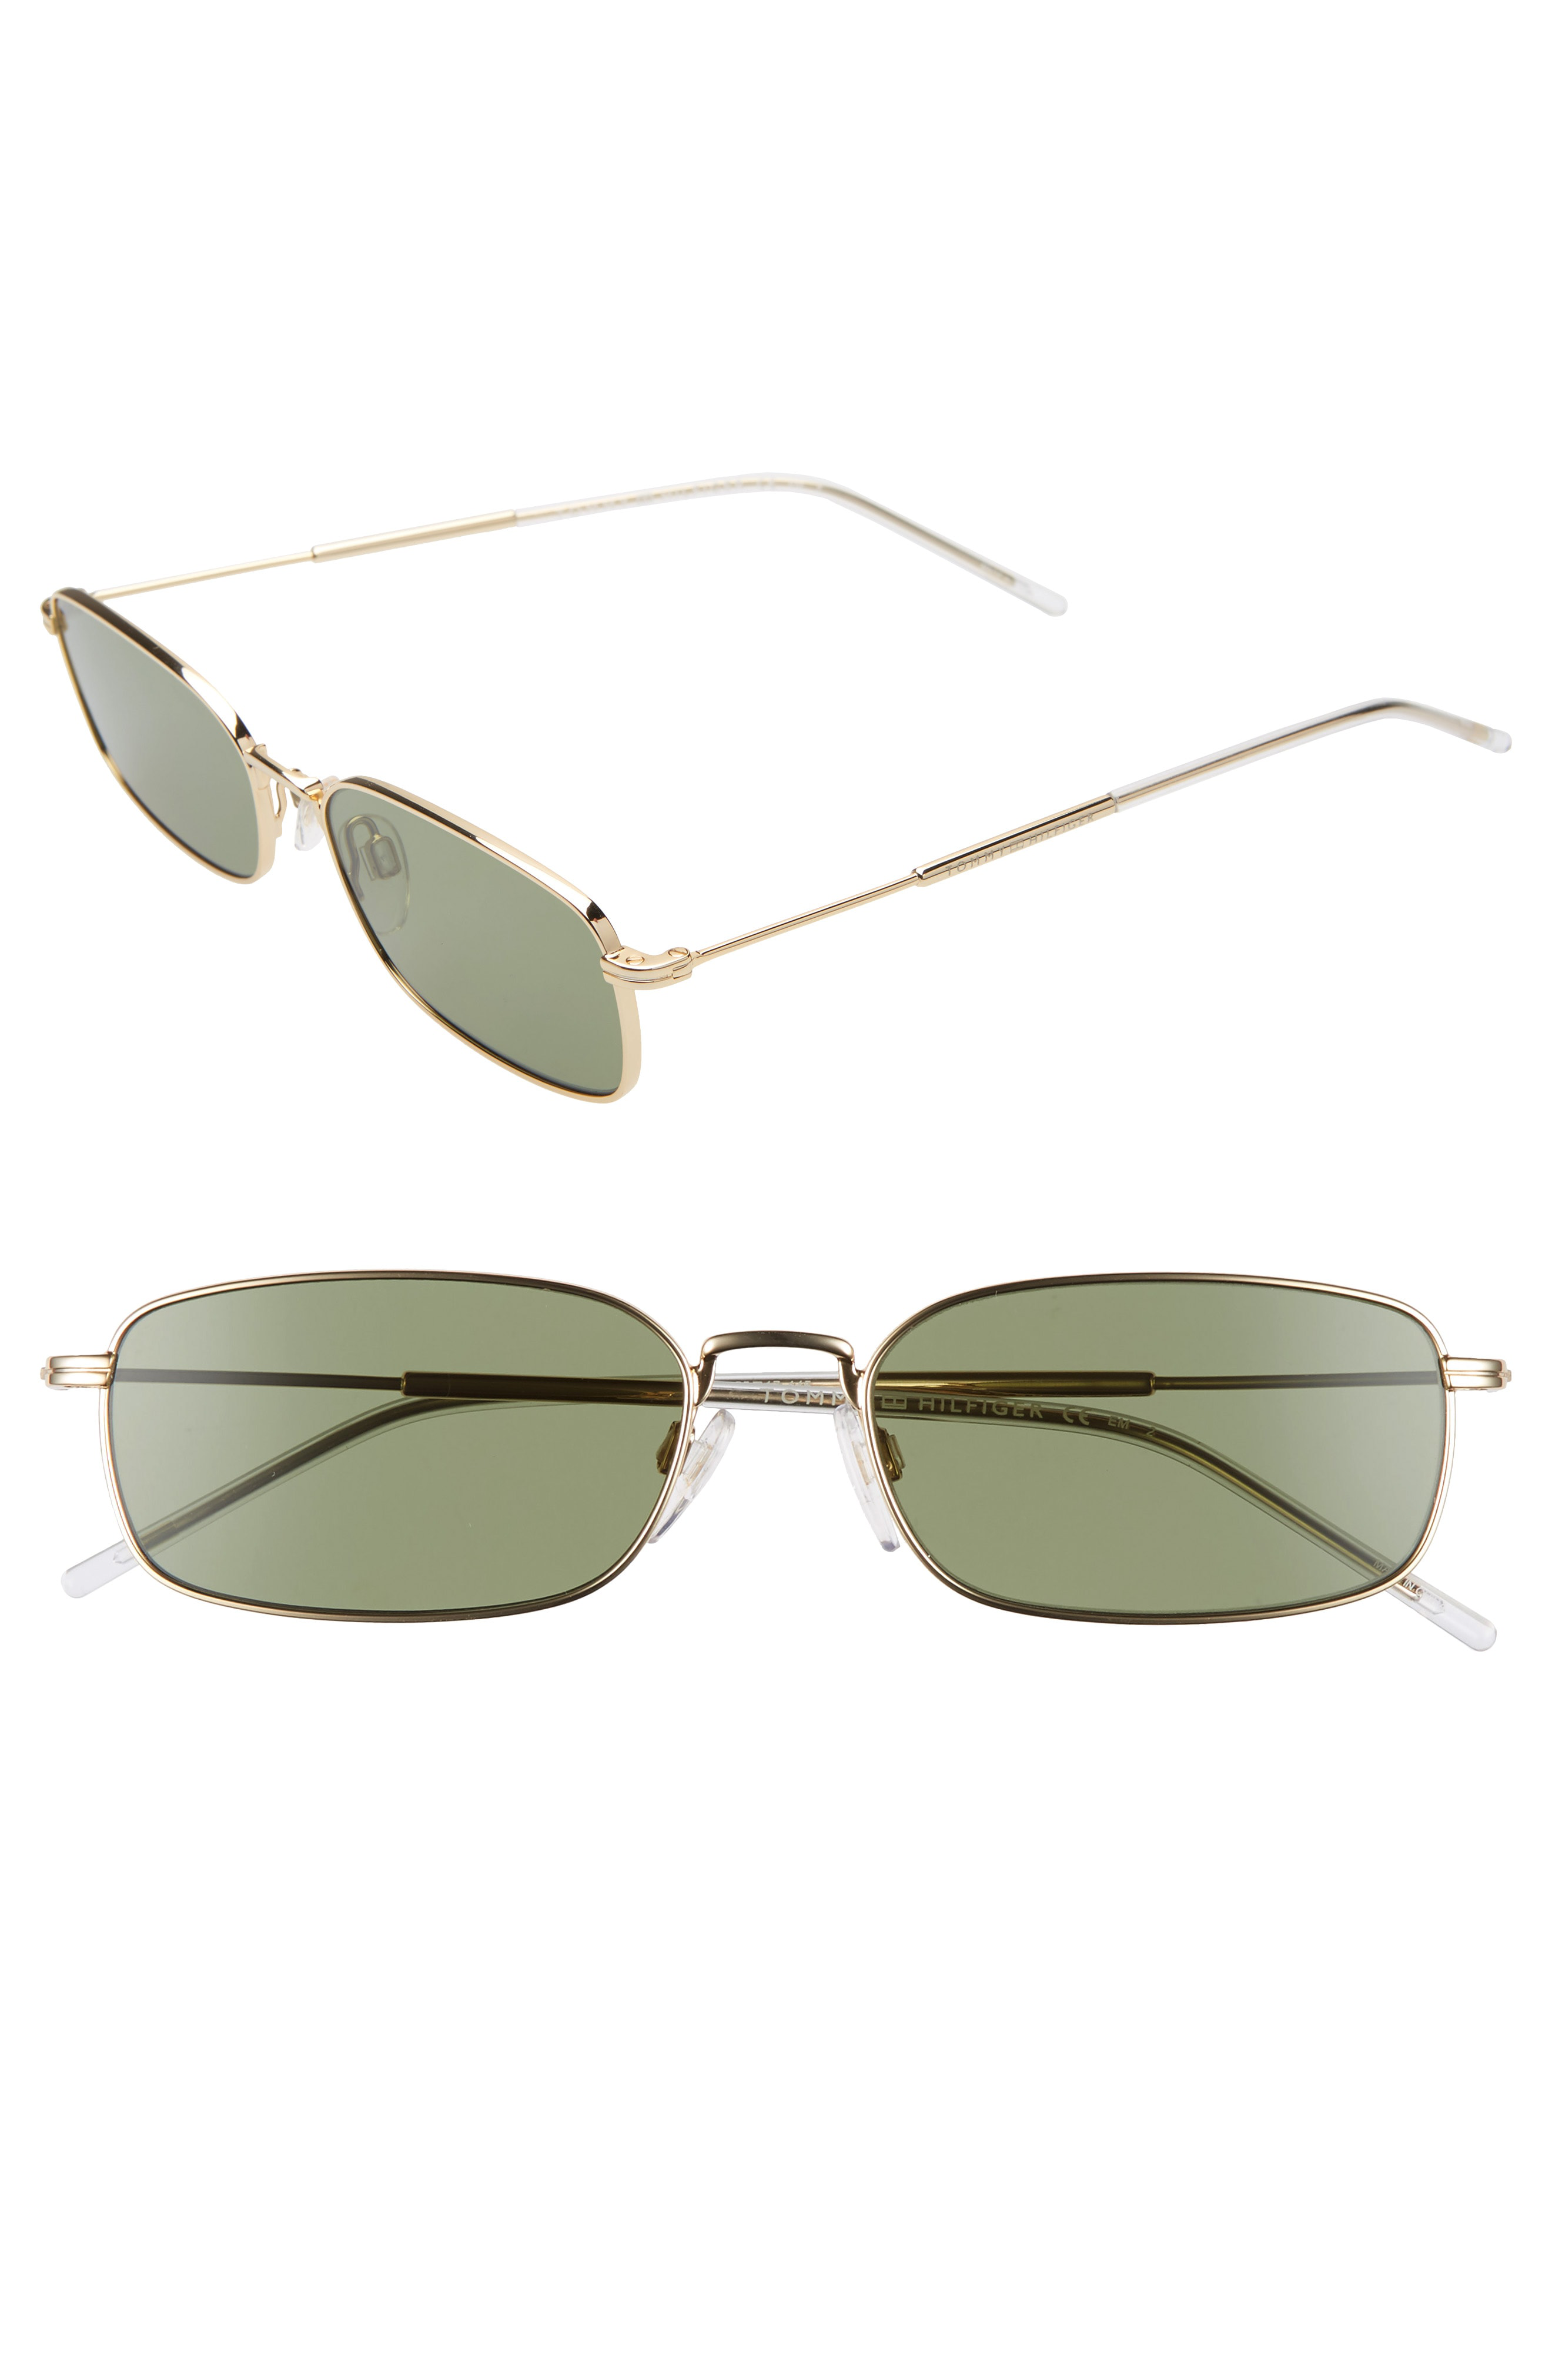 8a472f6c092f Tommy Hilfiger 55Mm Rectangle Sunglasses - Gold  Green